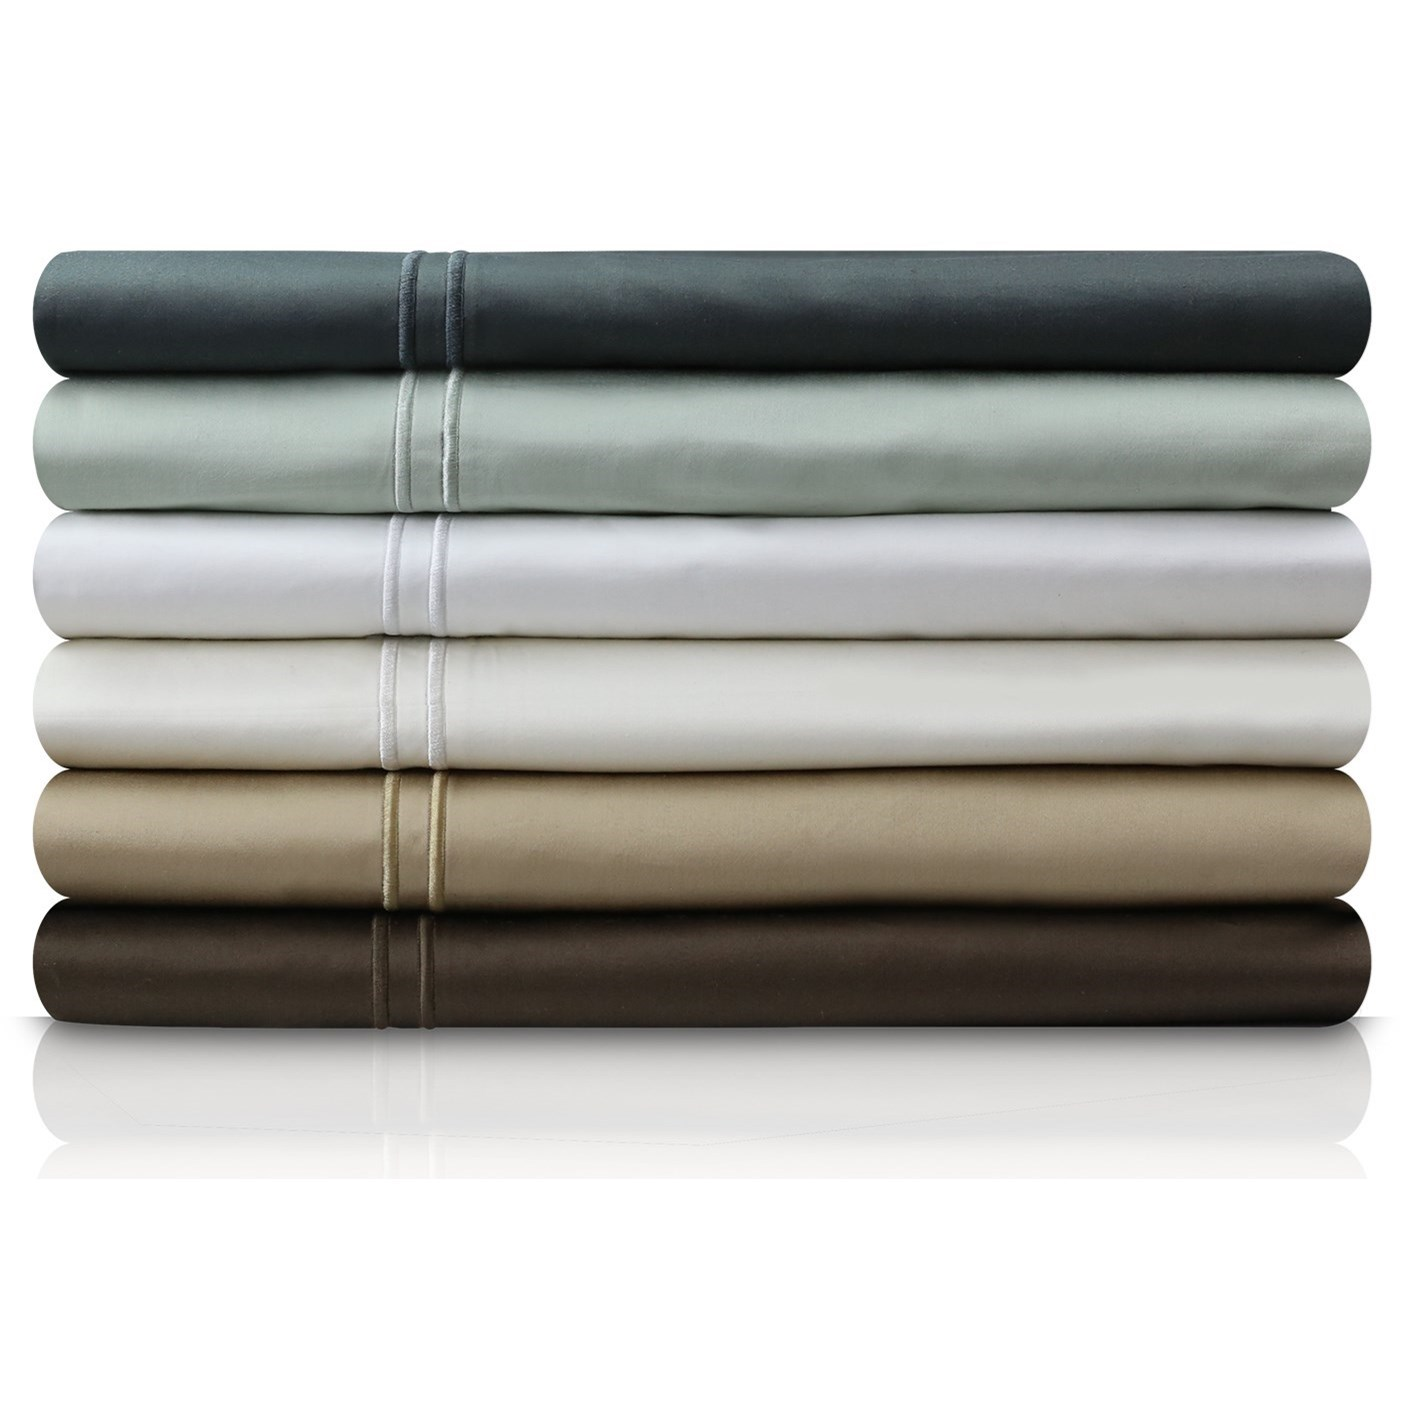 Malouf Egyptian Cotton King 600 TC Egyptian Cotton Pillowcases  - Item Number: MA06KKKHPC